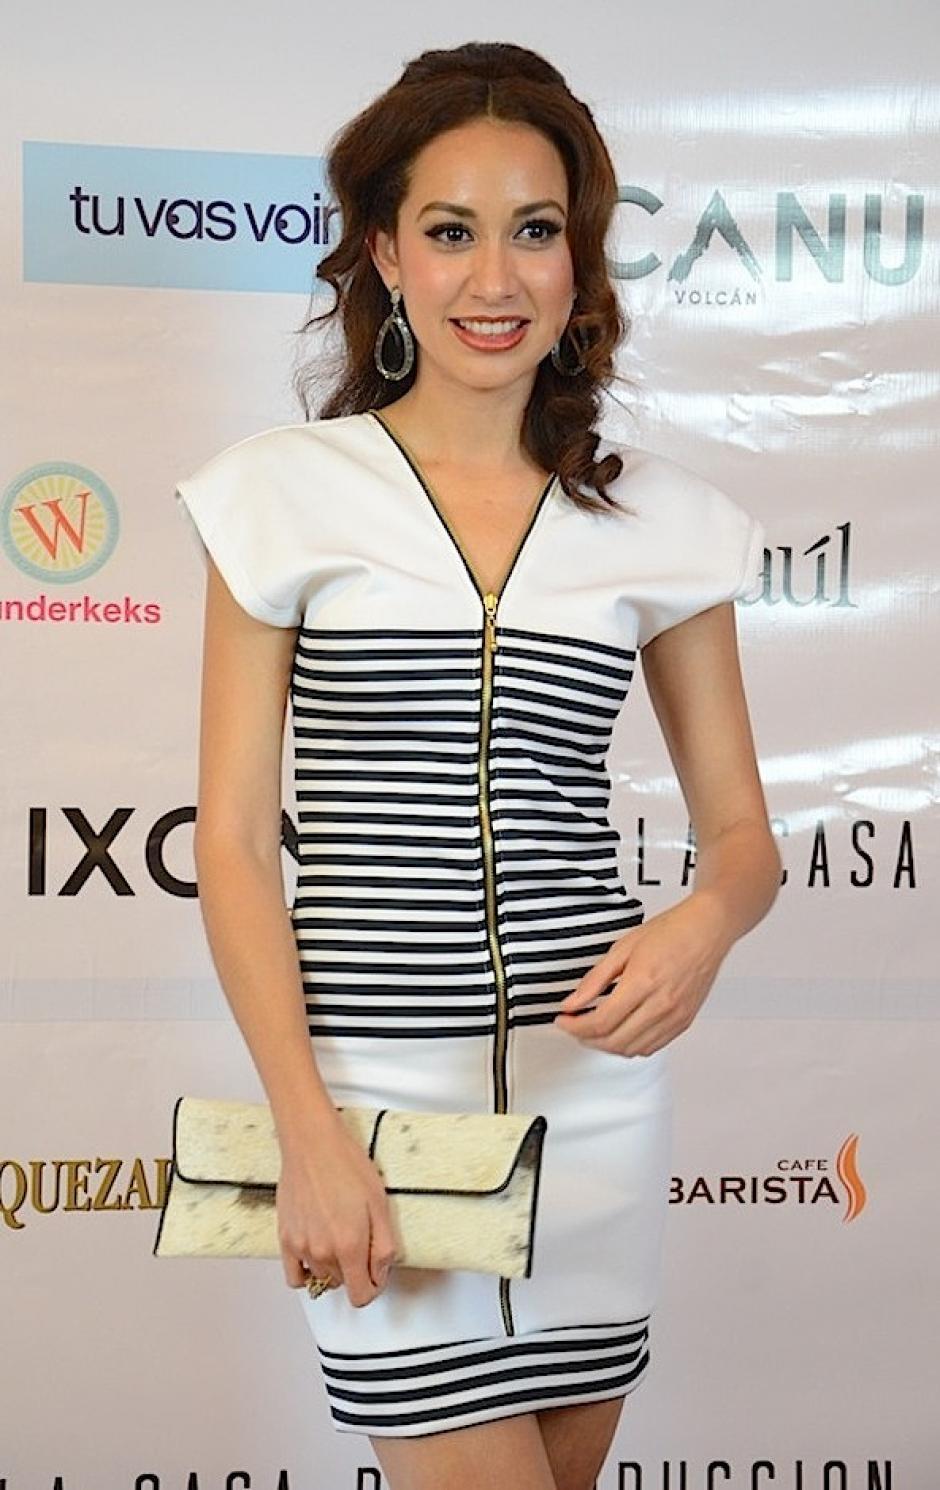 la modelo nacional Cinthia Contreras asistió a la gala. (Foto: Selene Mejía/Soy502)